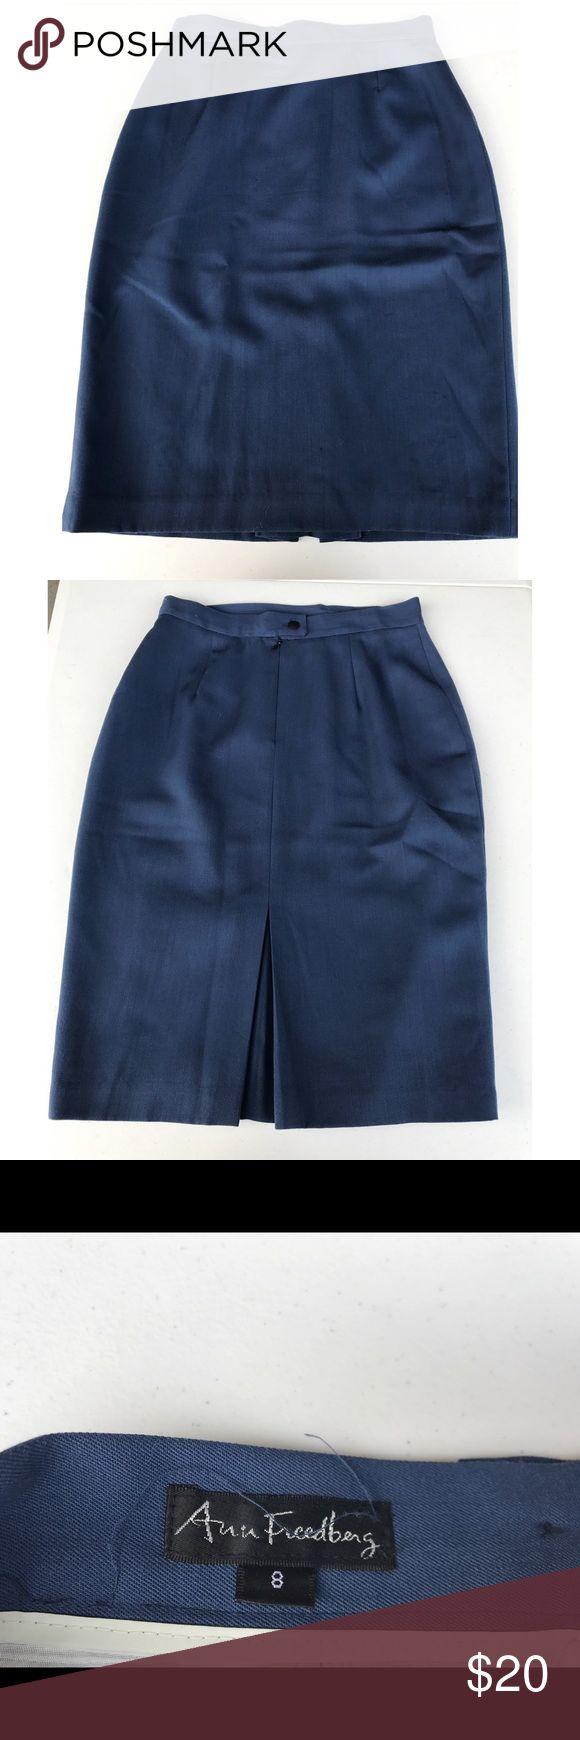 Ann Freedberg Celestial Blue Pencil Skirt Ann Freedberg celestial blue pencil skirt, Size 8 (sk1) Ann Freedberg Skirts Pencil